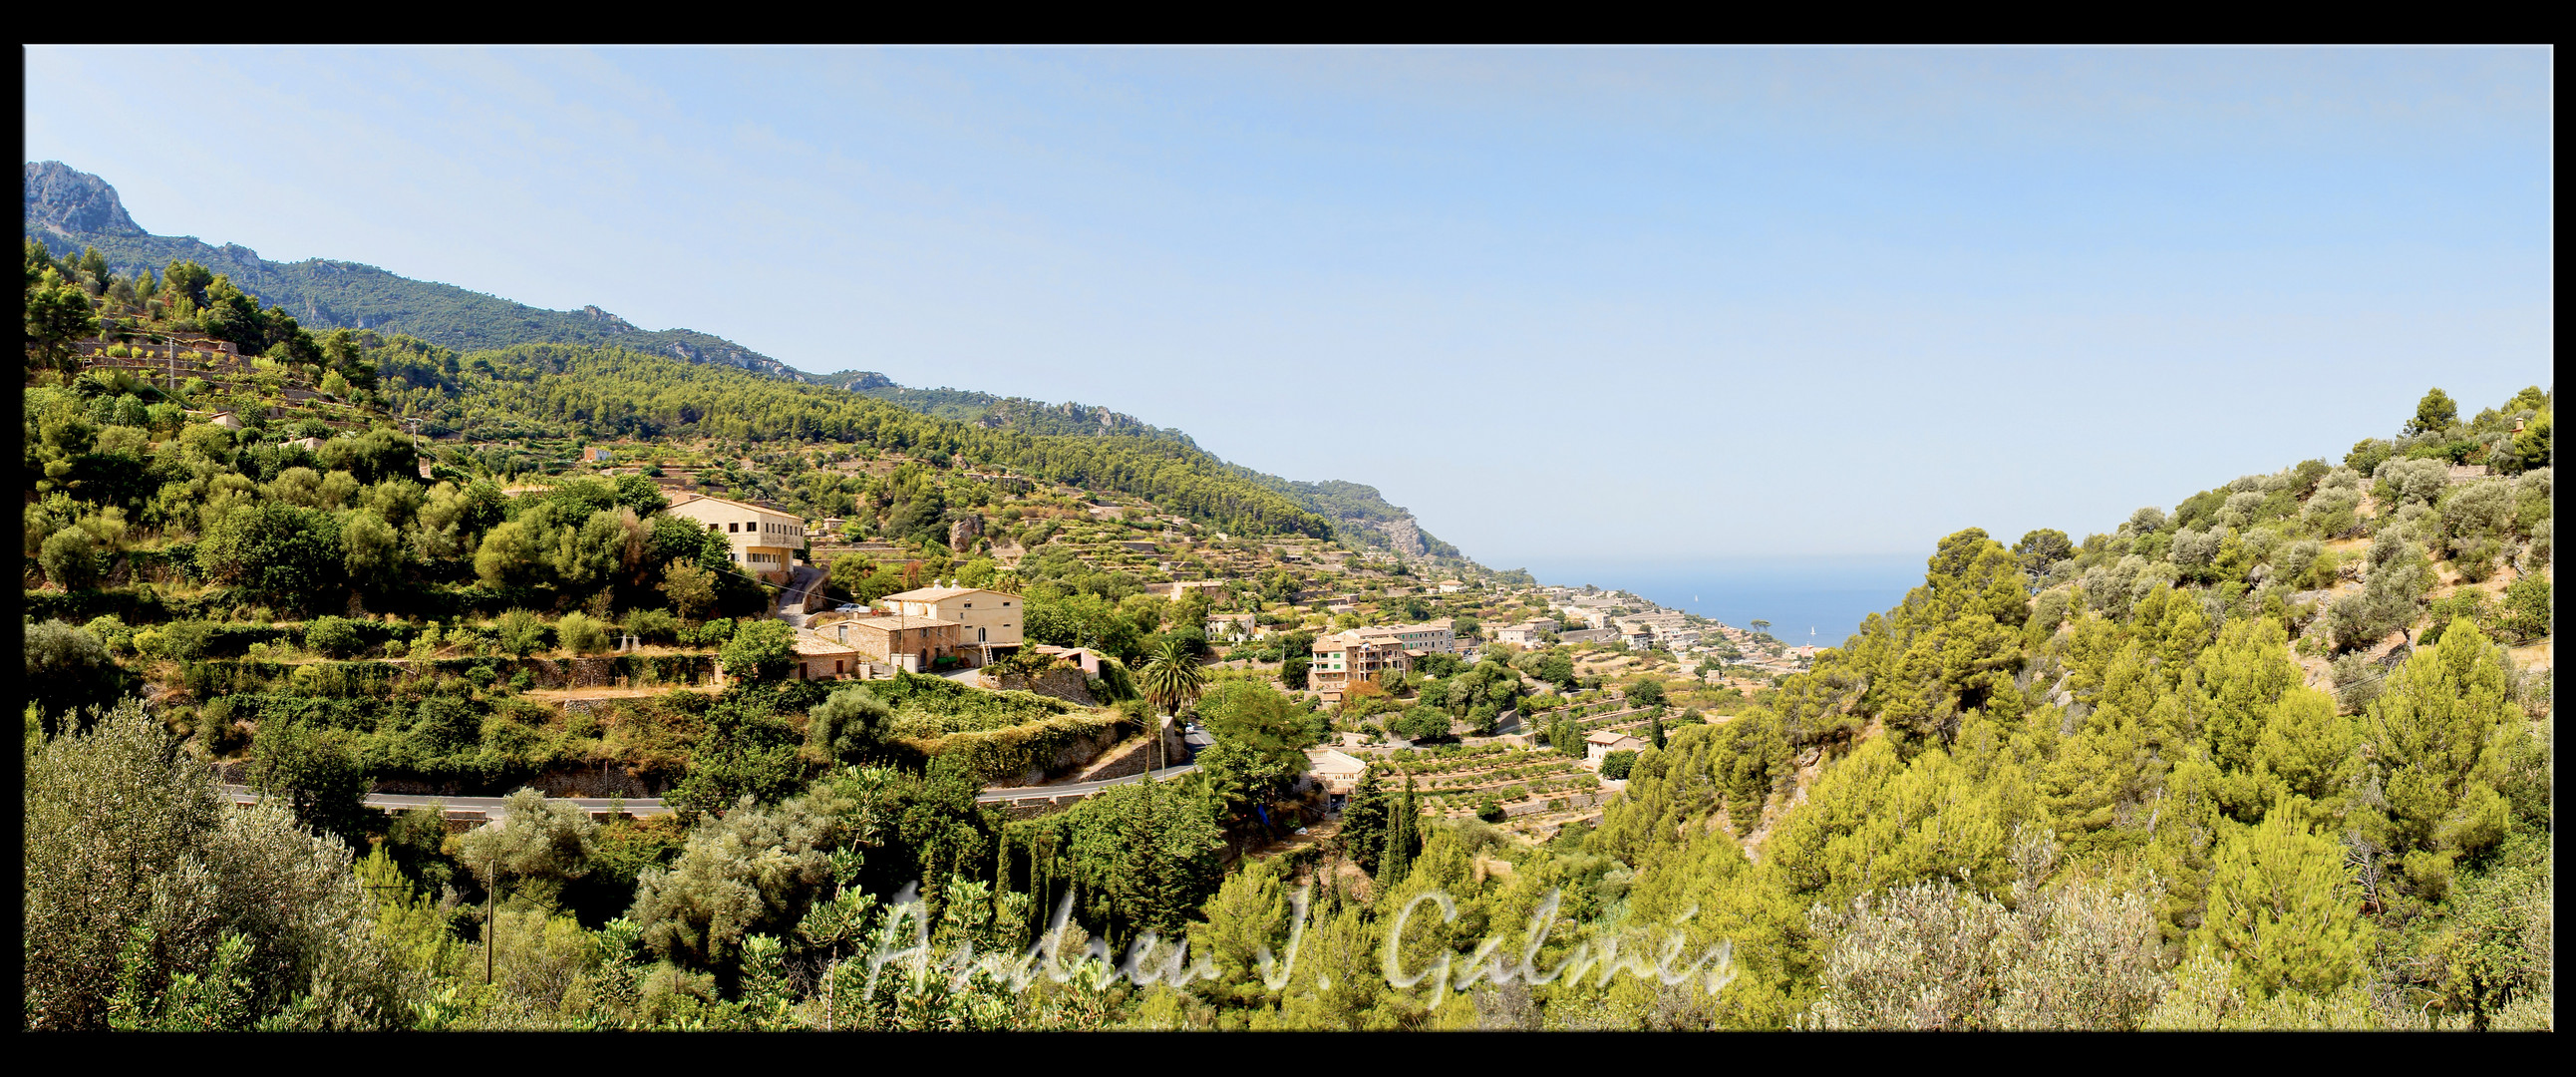 Banyalbufar - serra de Tramuntana - Mallorca